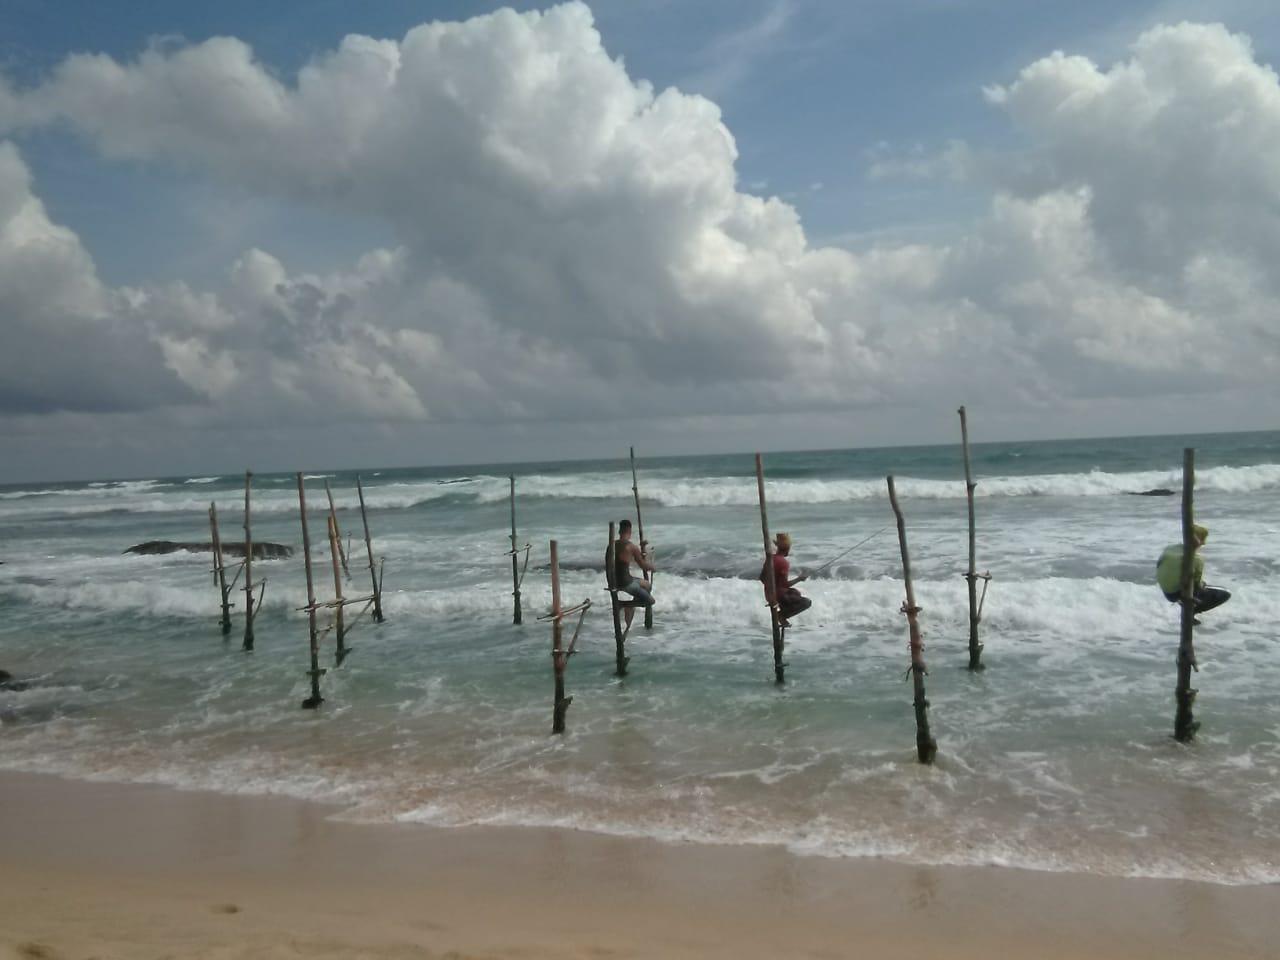 invite-to-paradise-sri-lanka-holiday-honeymoon-specialists-customer-feedback-elin-jordan-luce-stilt-fisherman-fishing-try-yourself-2.JPG